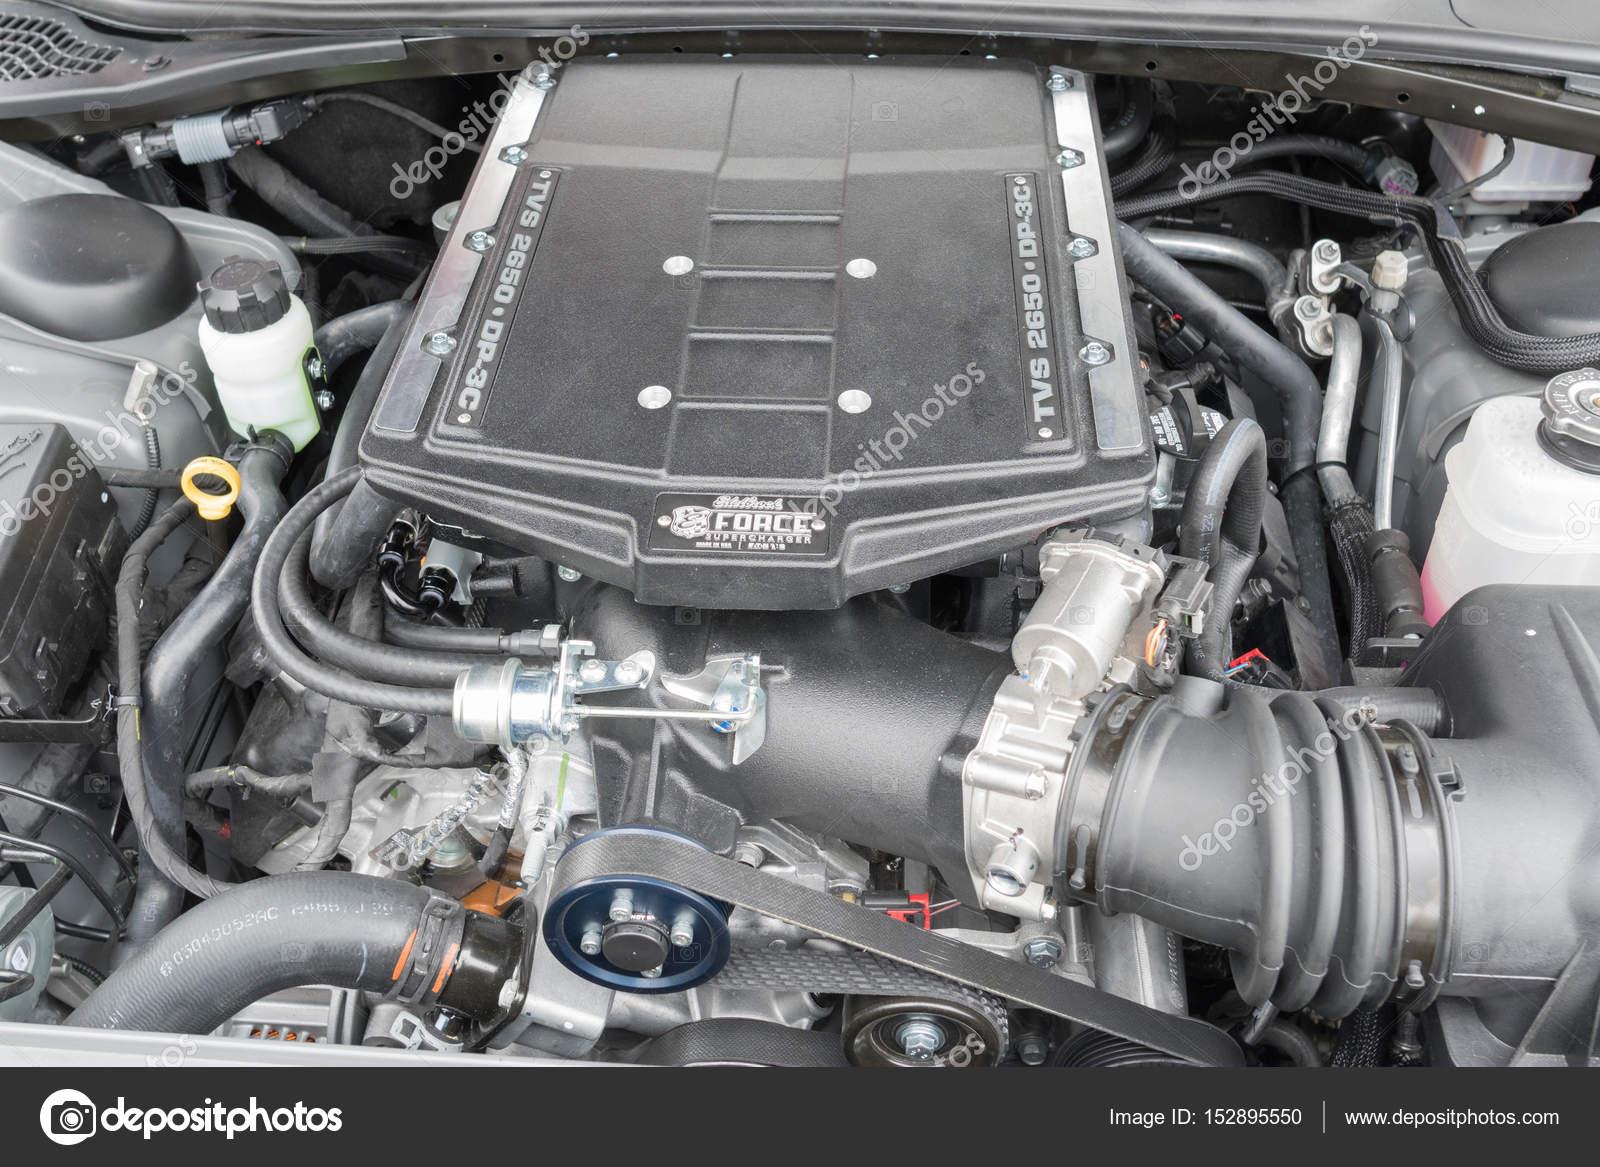 Dodge Challenger Rt Engine On Display Stock Editorial Photo